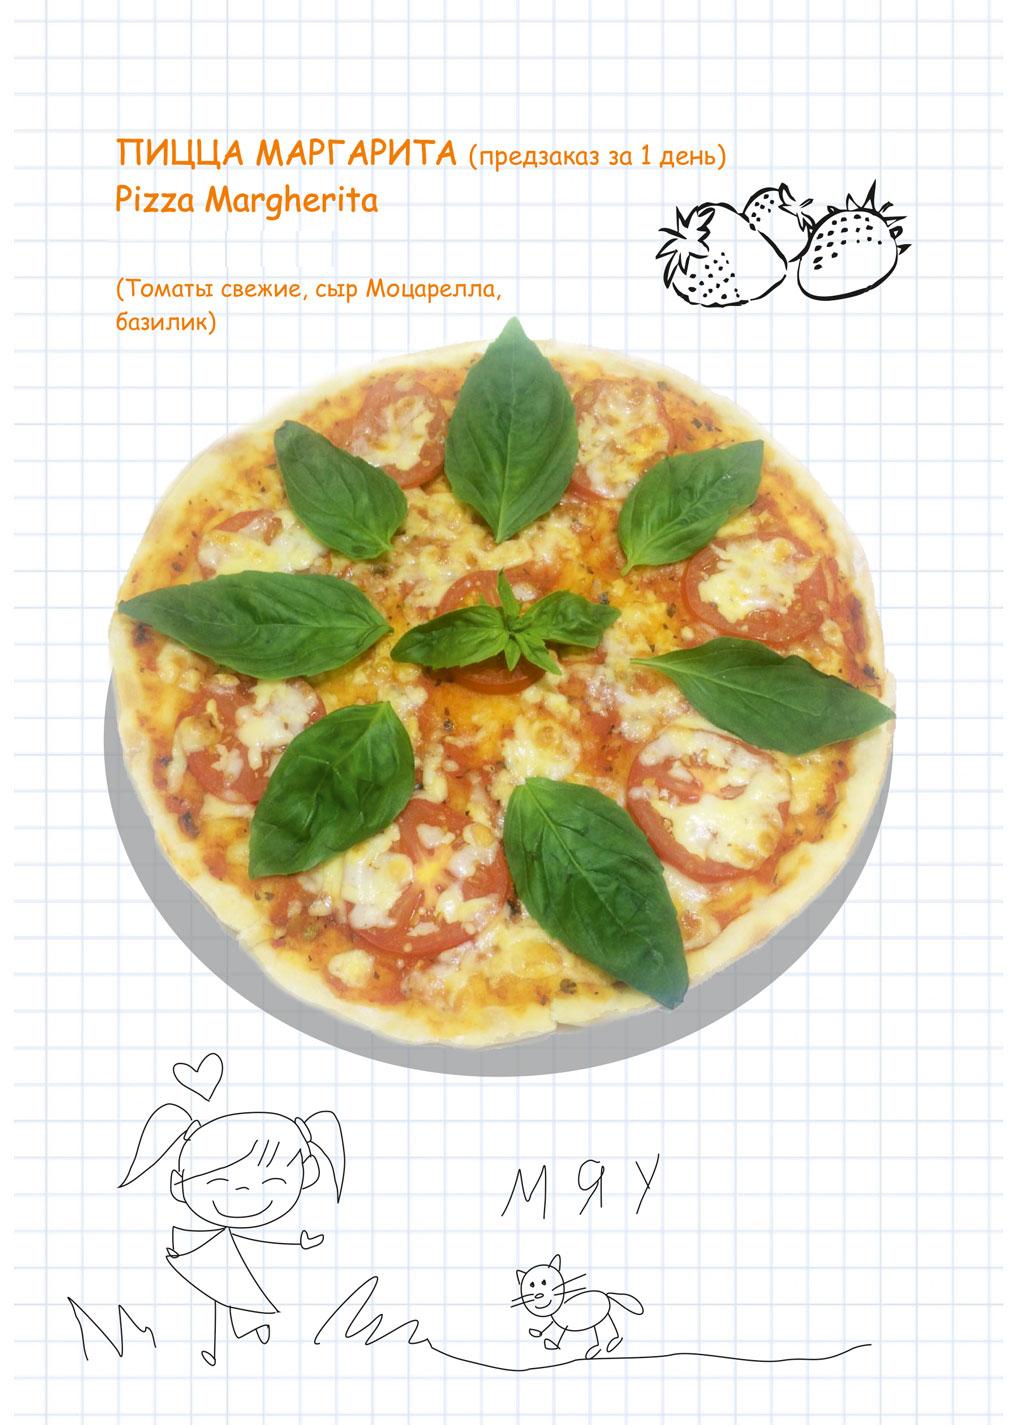 Пицца Маргарита (предзаказ за 1 день) (Pizza margherita) в ресторане Аннам Брахма в Оренбурге